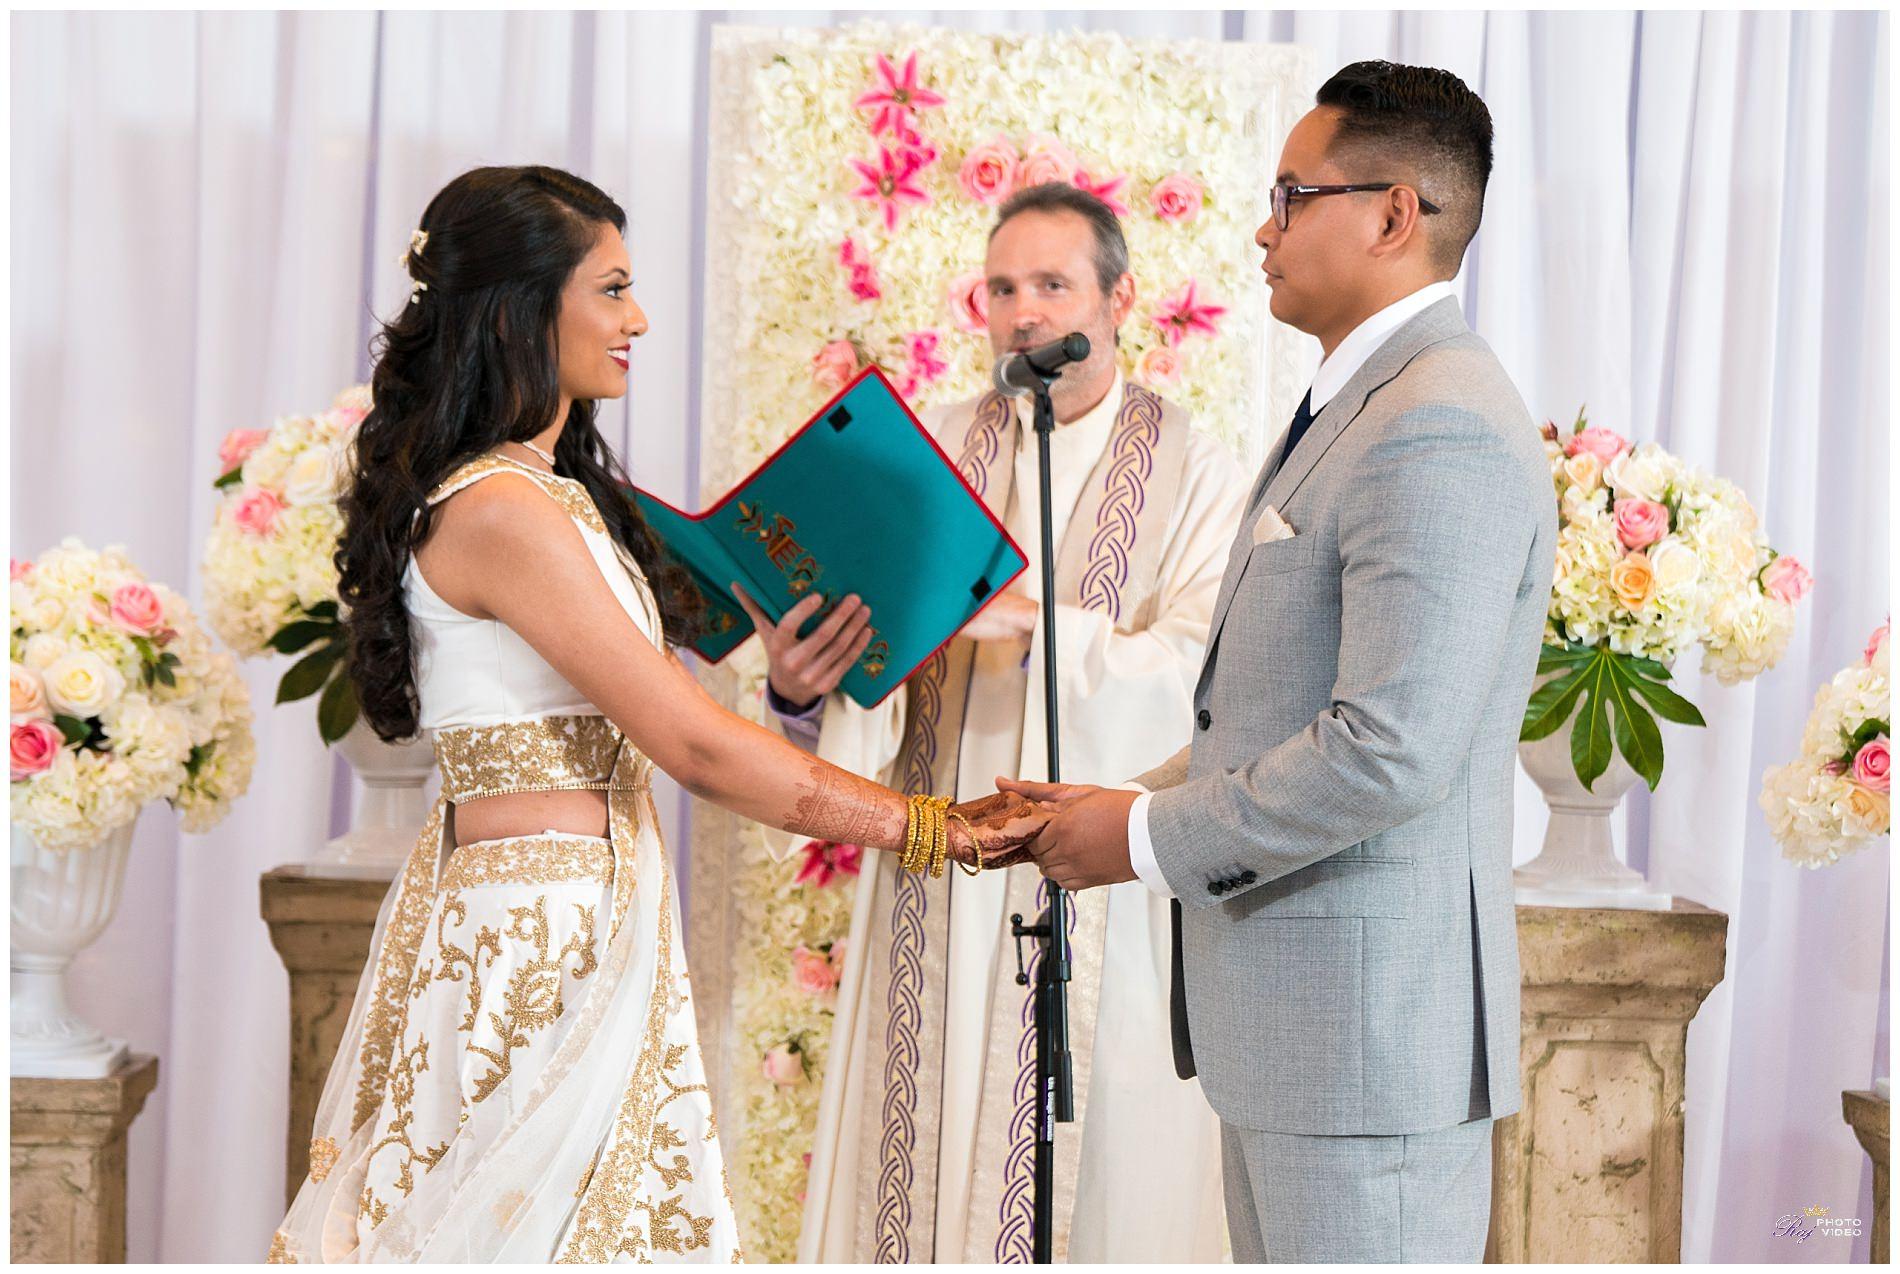 Royal-Manor-Garfield-NJ-Christian-Wedding-Ceremony-Khusbu-Jeff-43.jpg